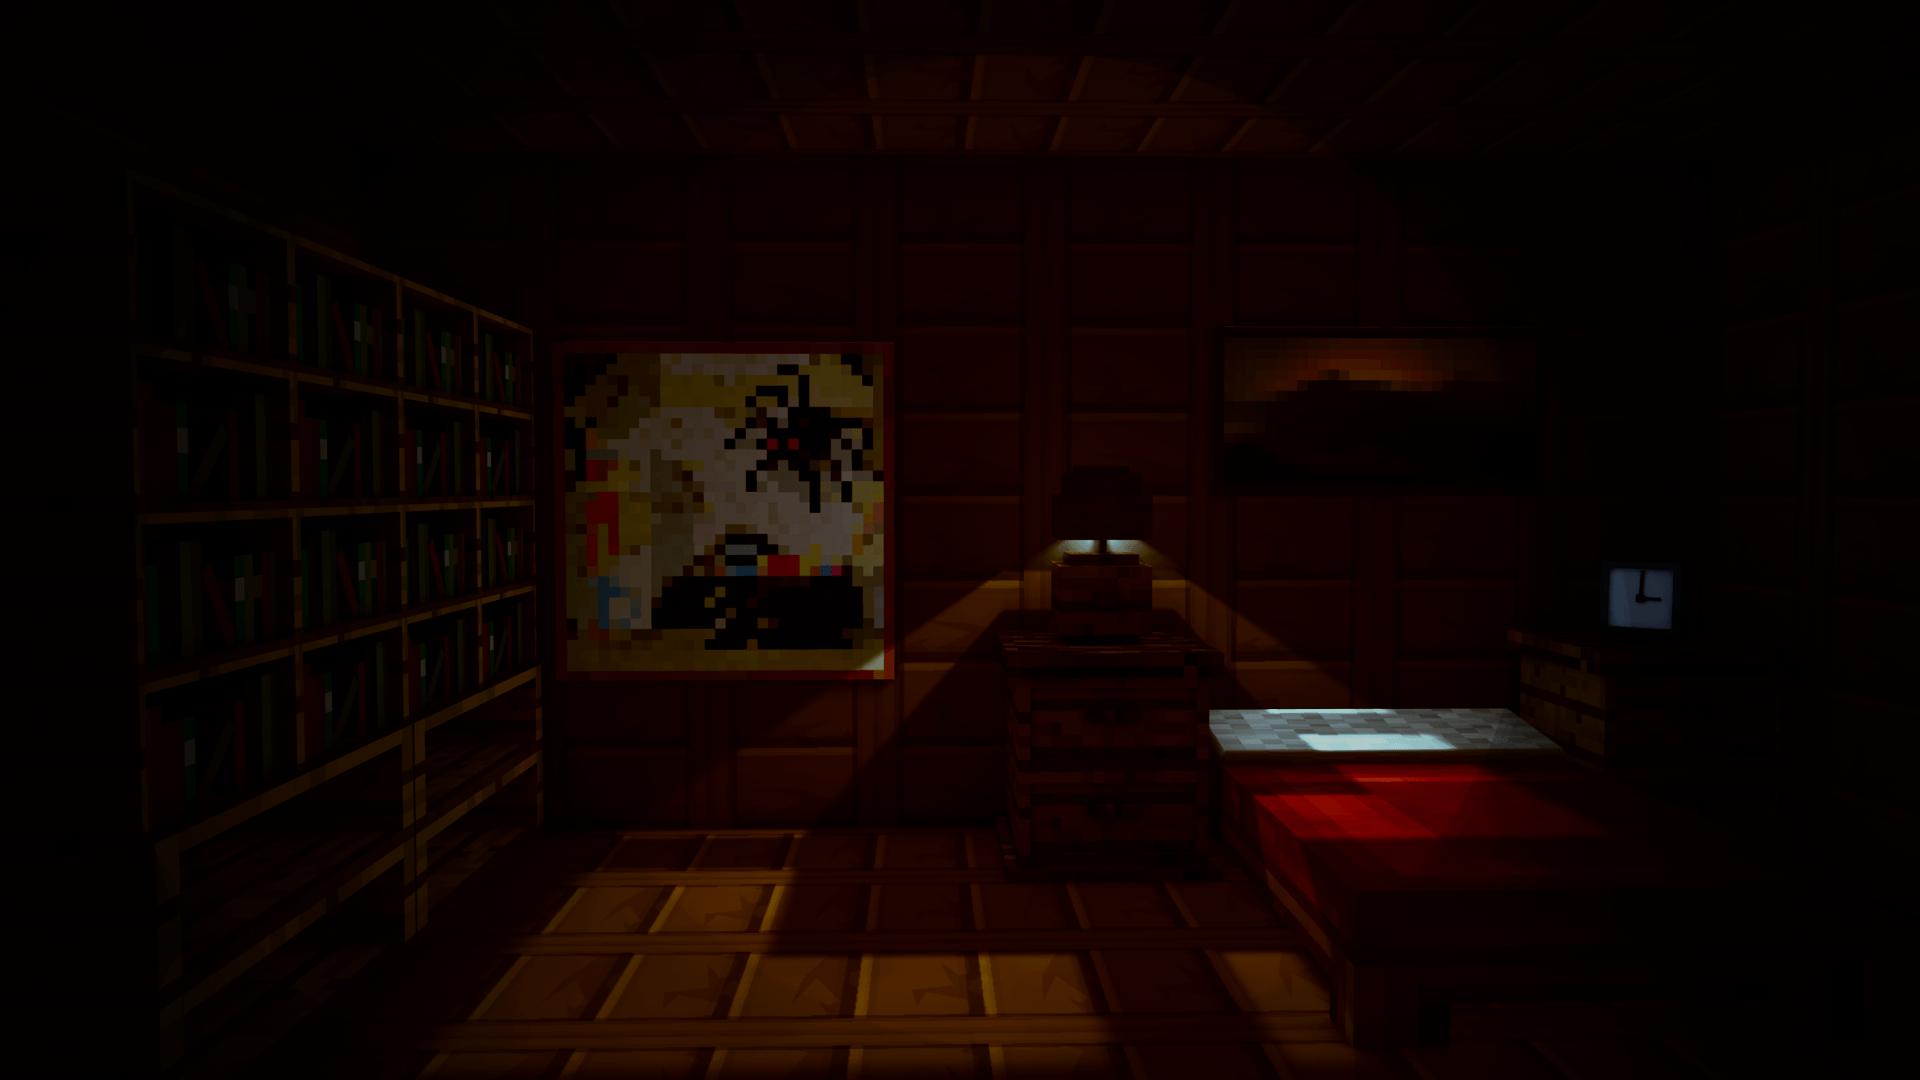 minecraft_halloween_render_by_vanillaplays-d82let1